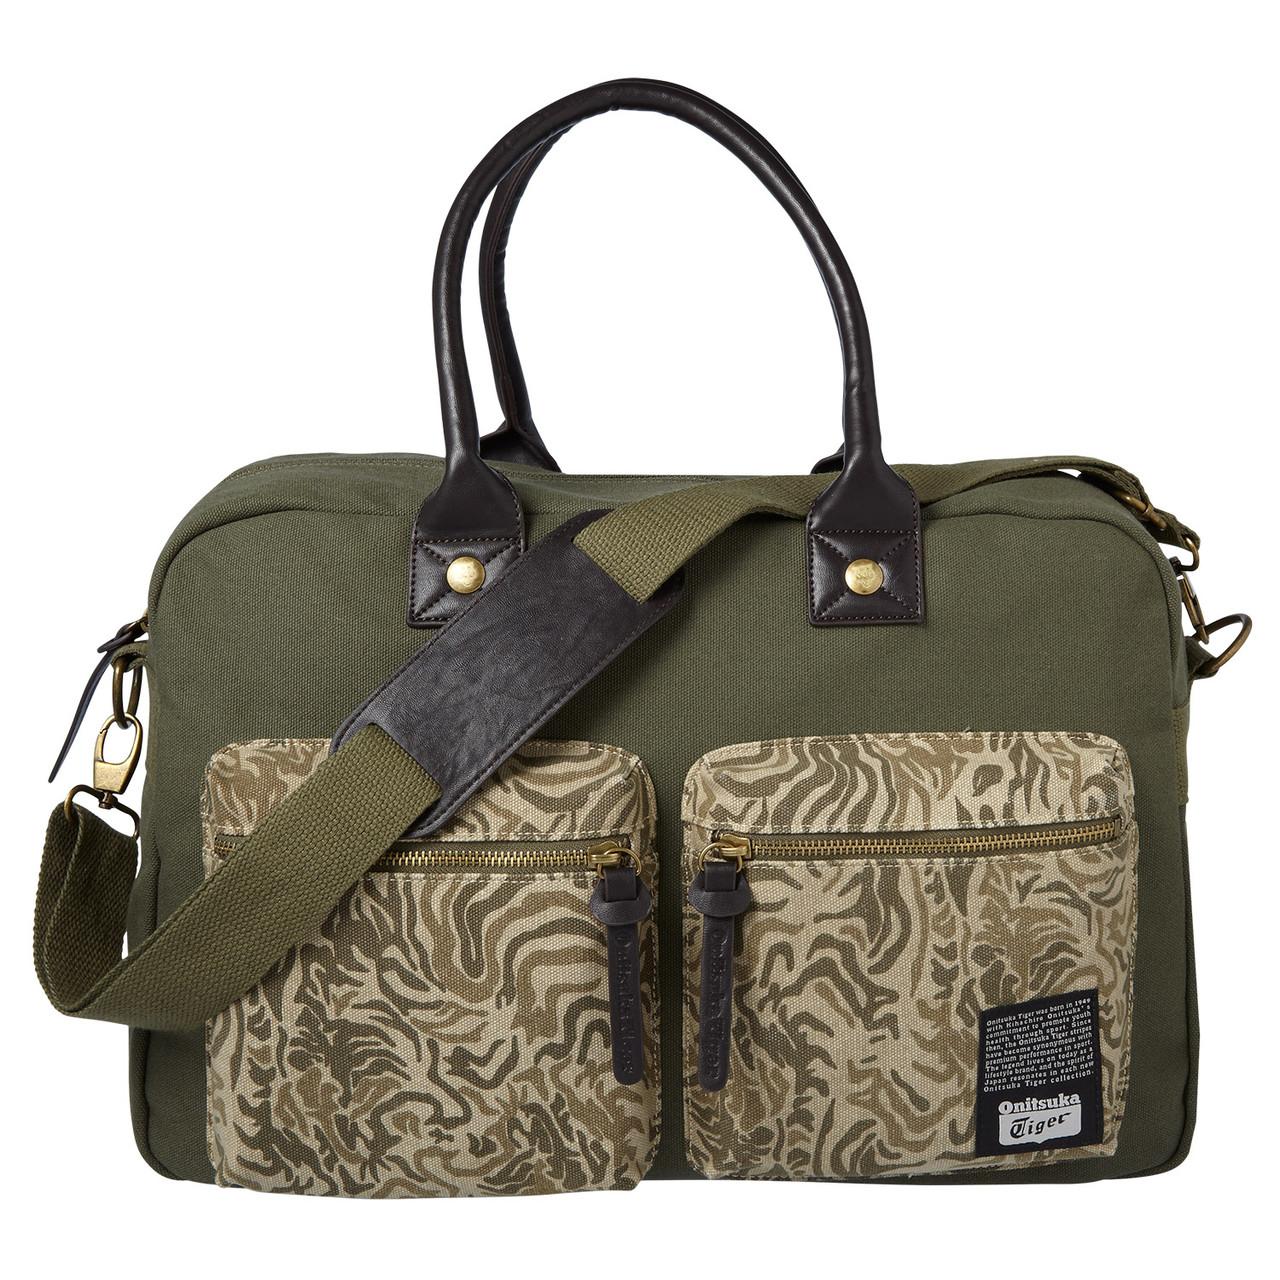 Сумка Asics Fashion Weekend Bag 122760 4001